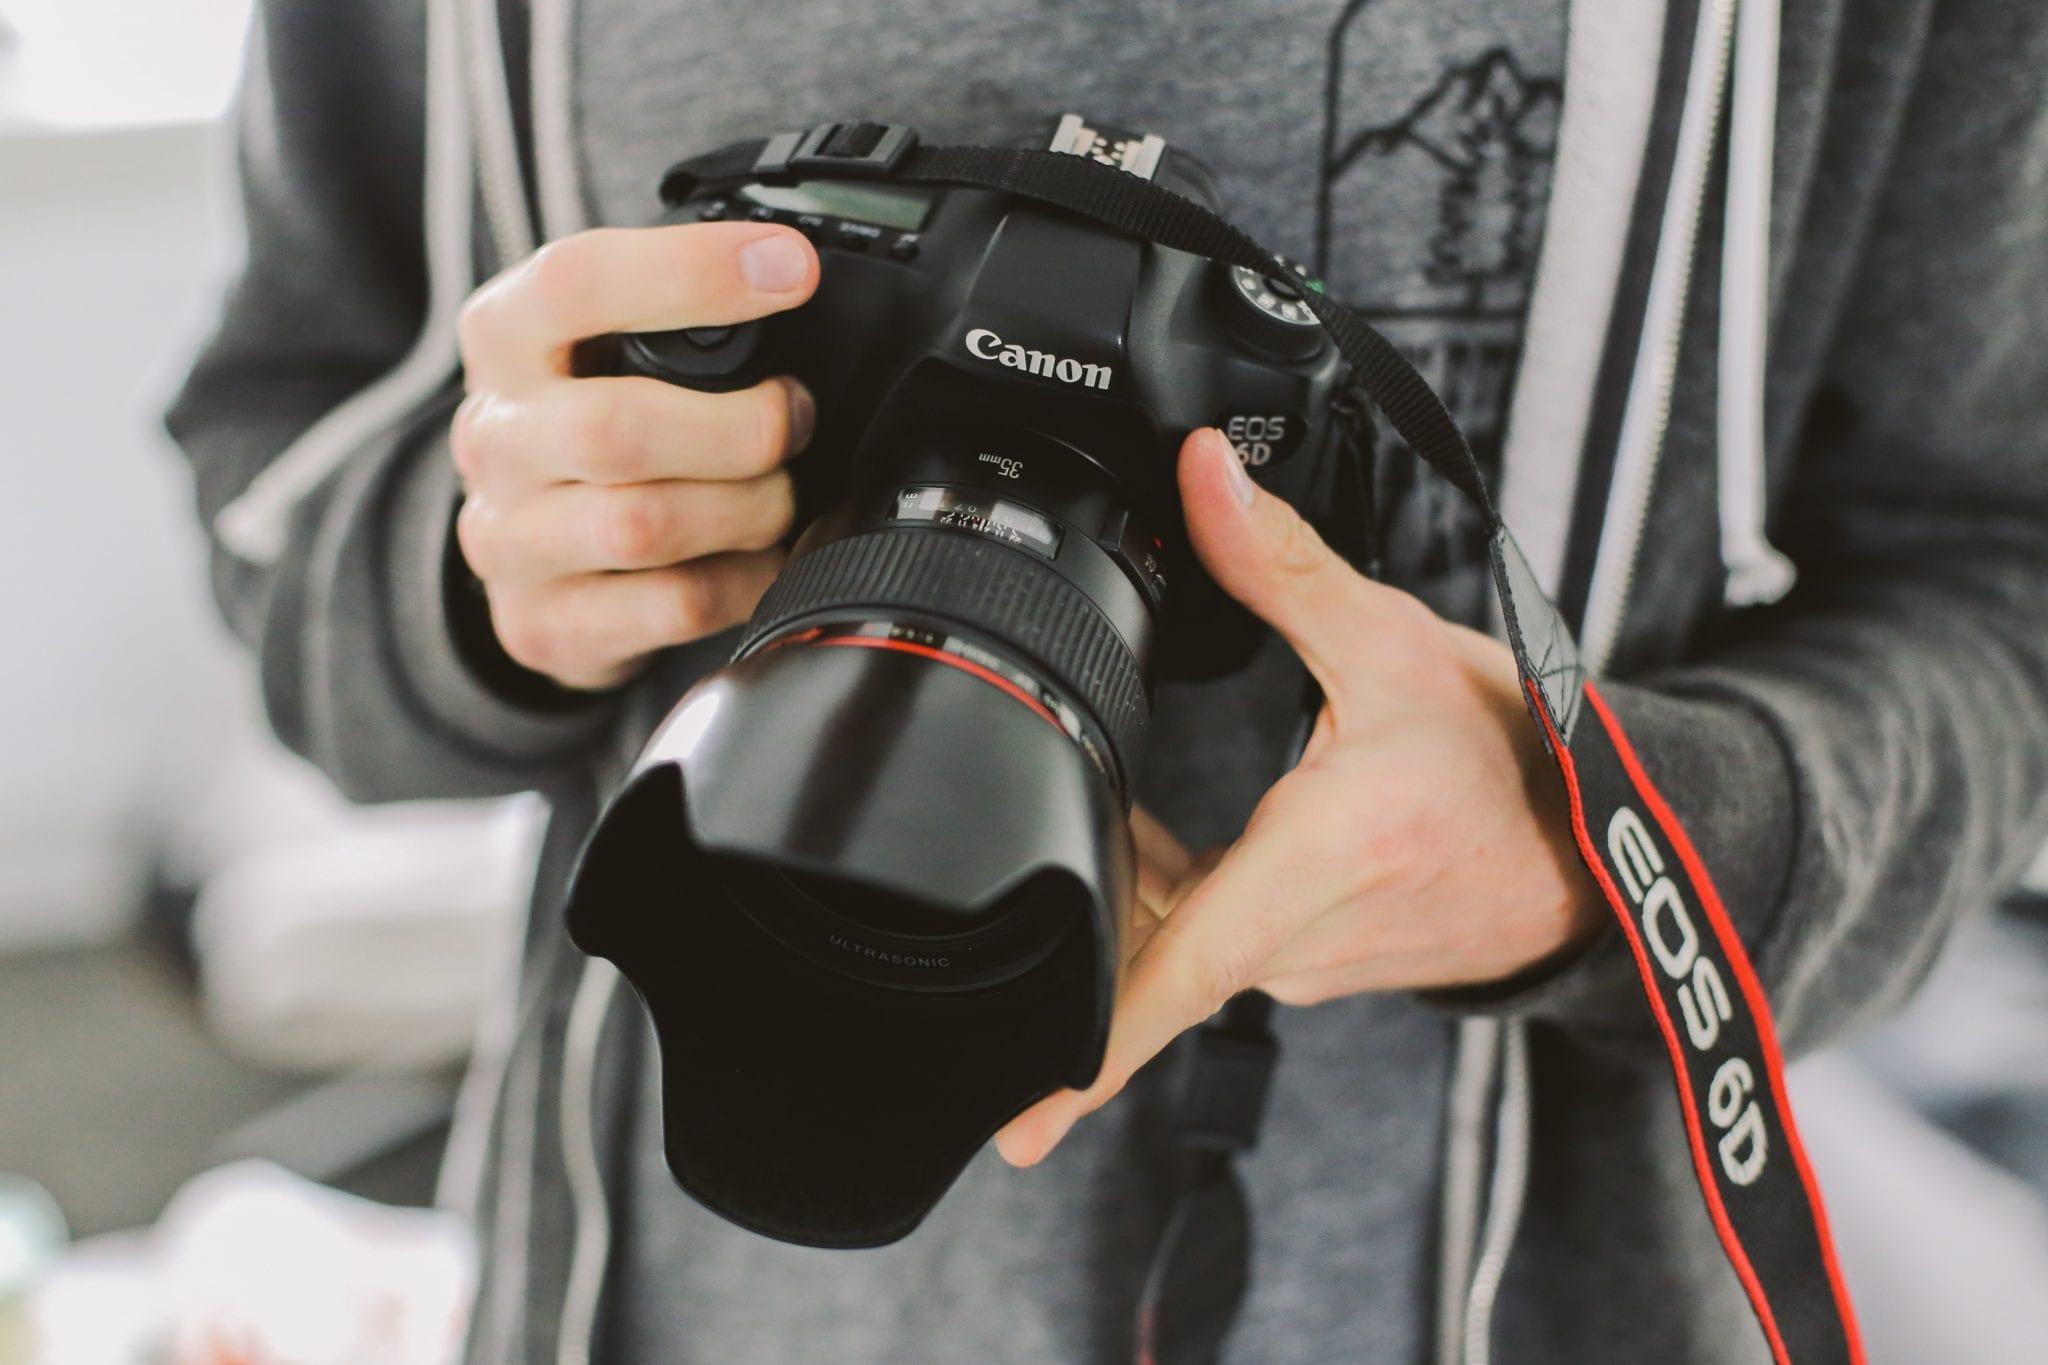 Real estate photographer holding Canon camera